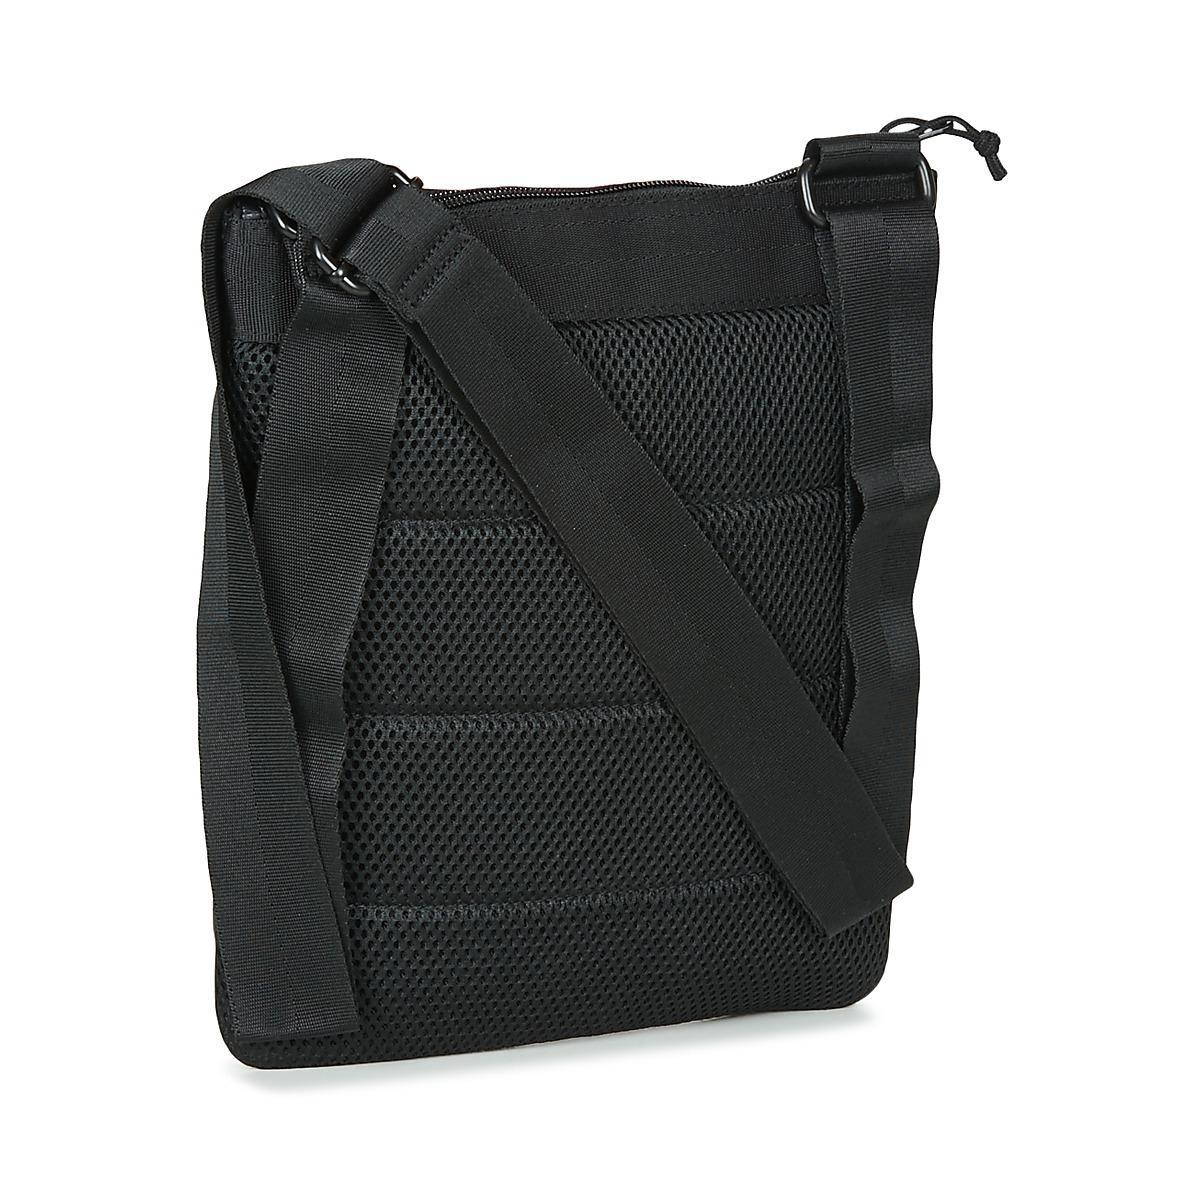 PUMA Ferrari Ls Flat Portable Men s Pouch In Black in Black for Men ... 45d451cdc3318